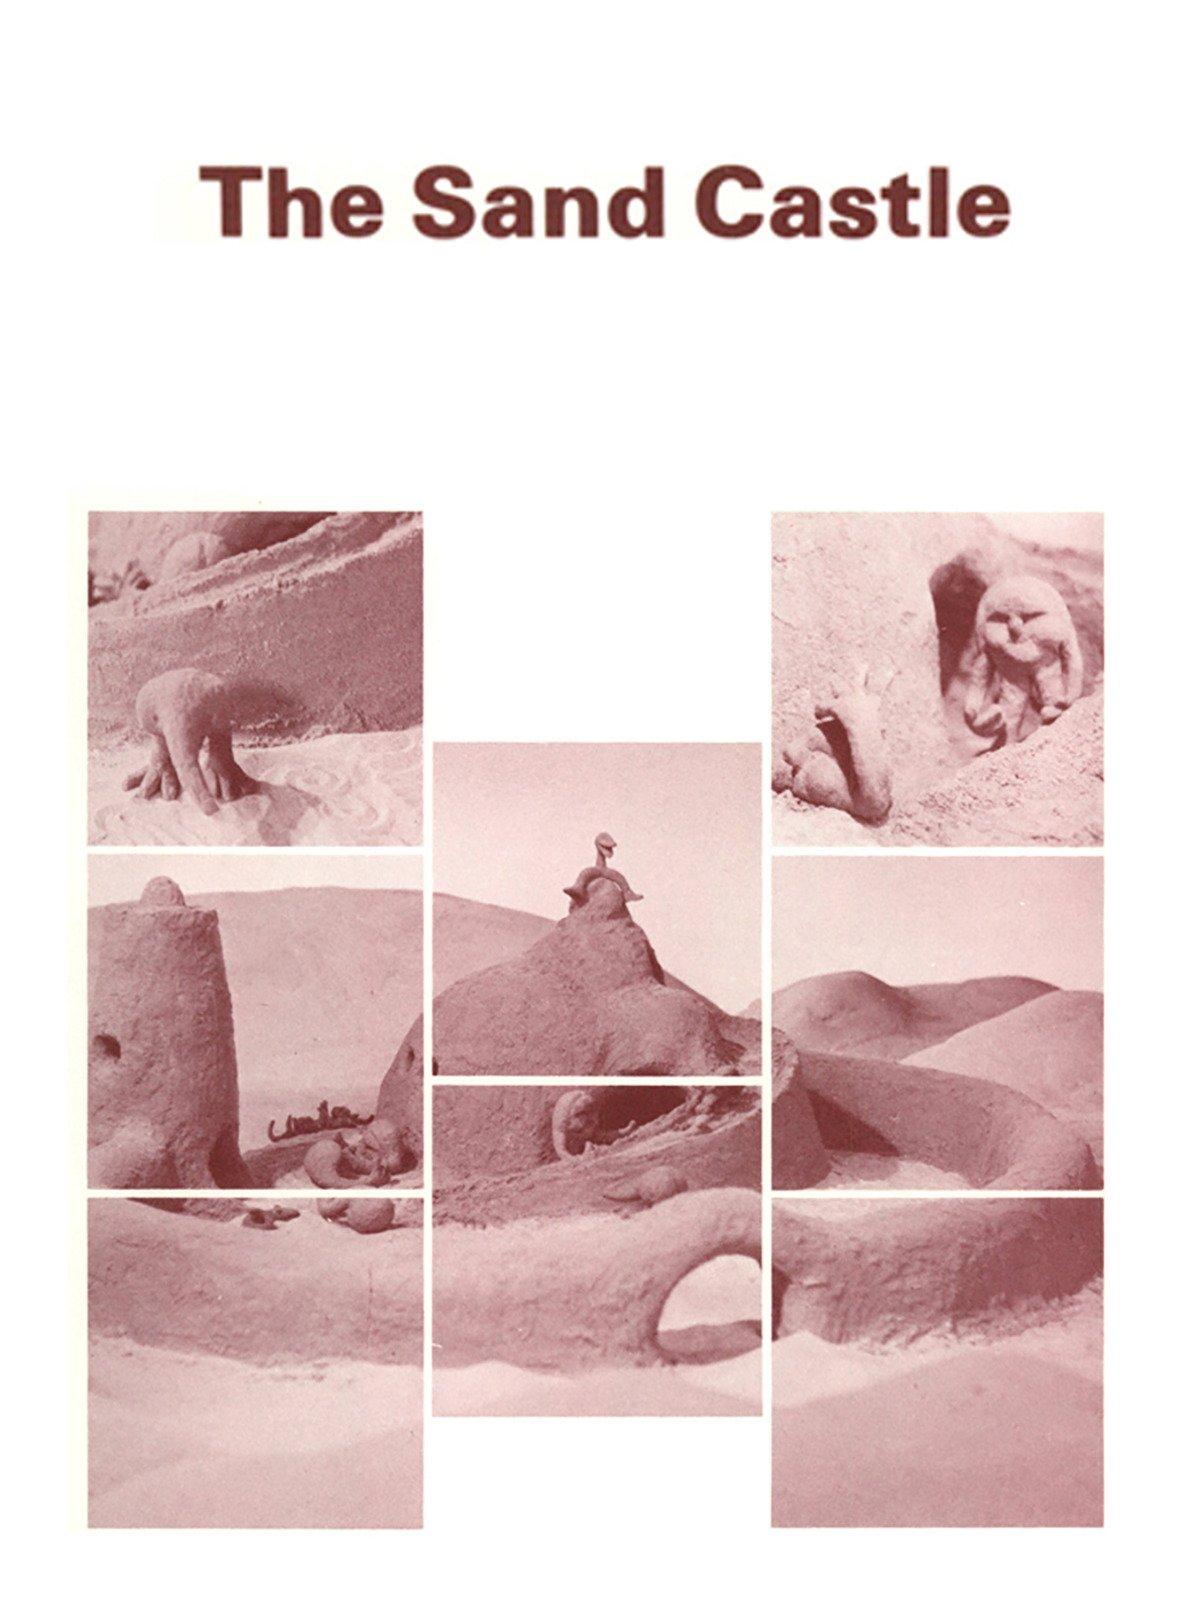 The Sand Castle